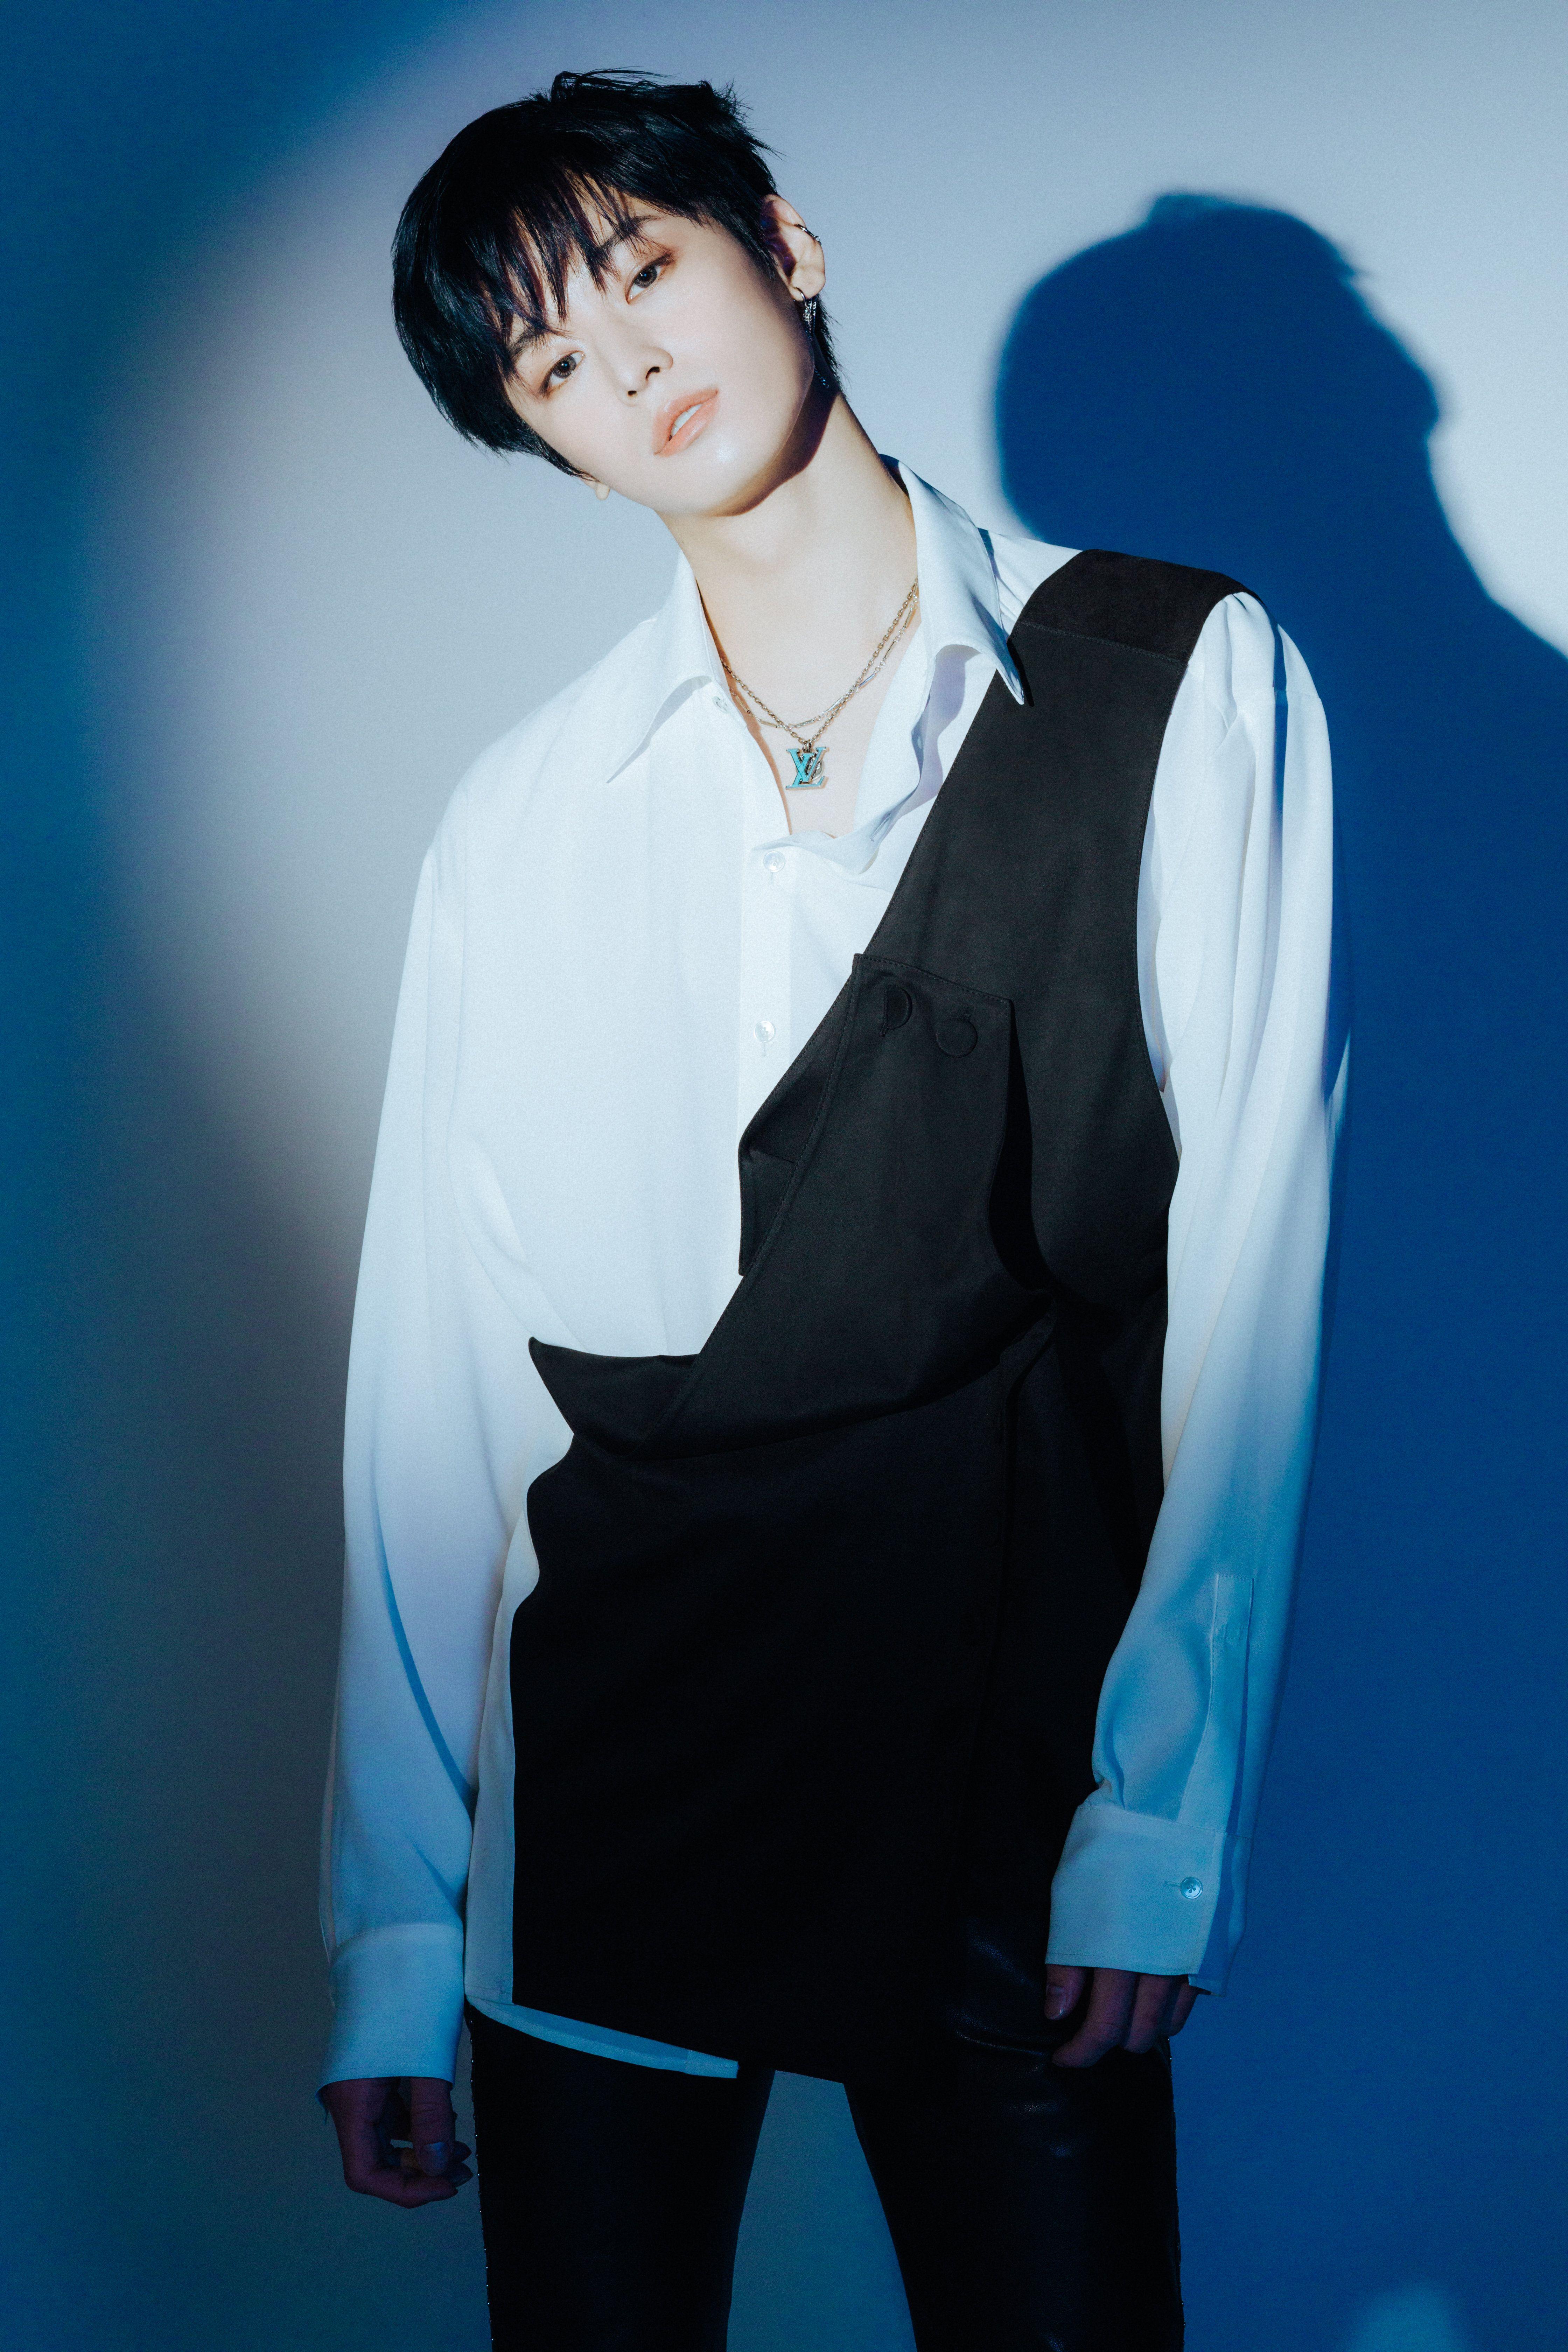 The Boyz Reveal Concept Photos Hd Hr Korean Idol Handsome Kpop